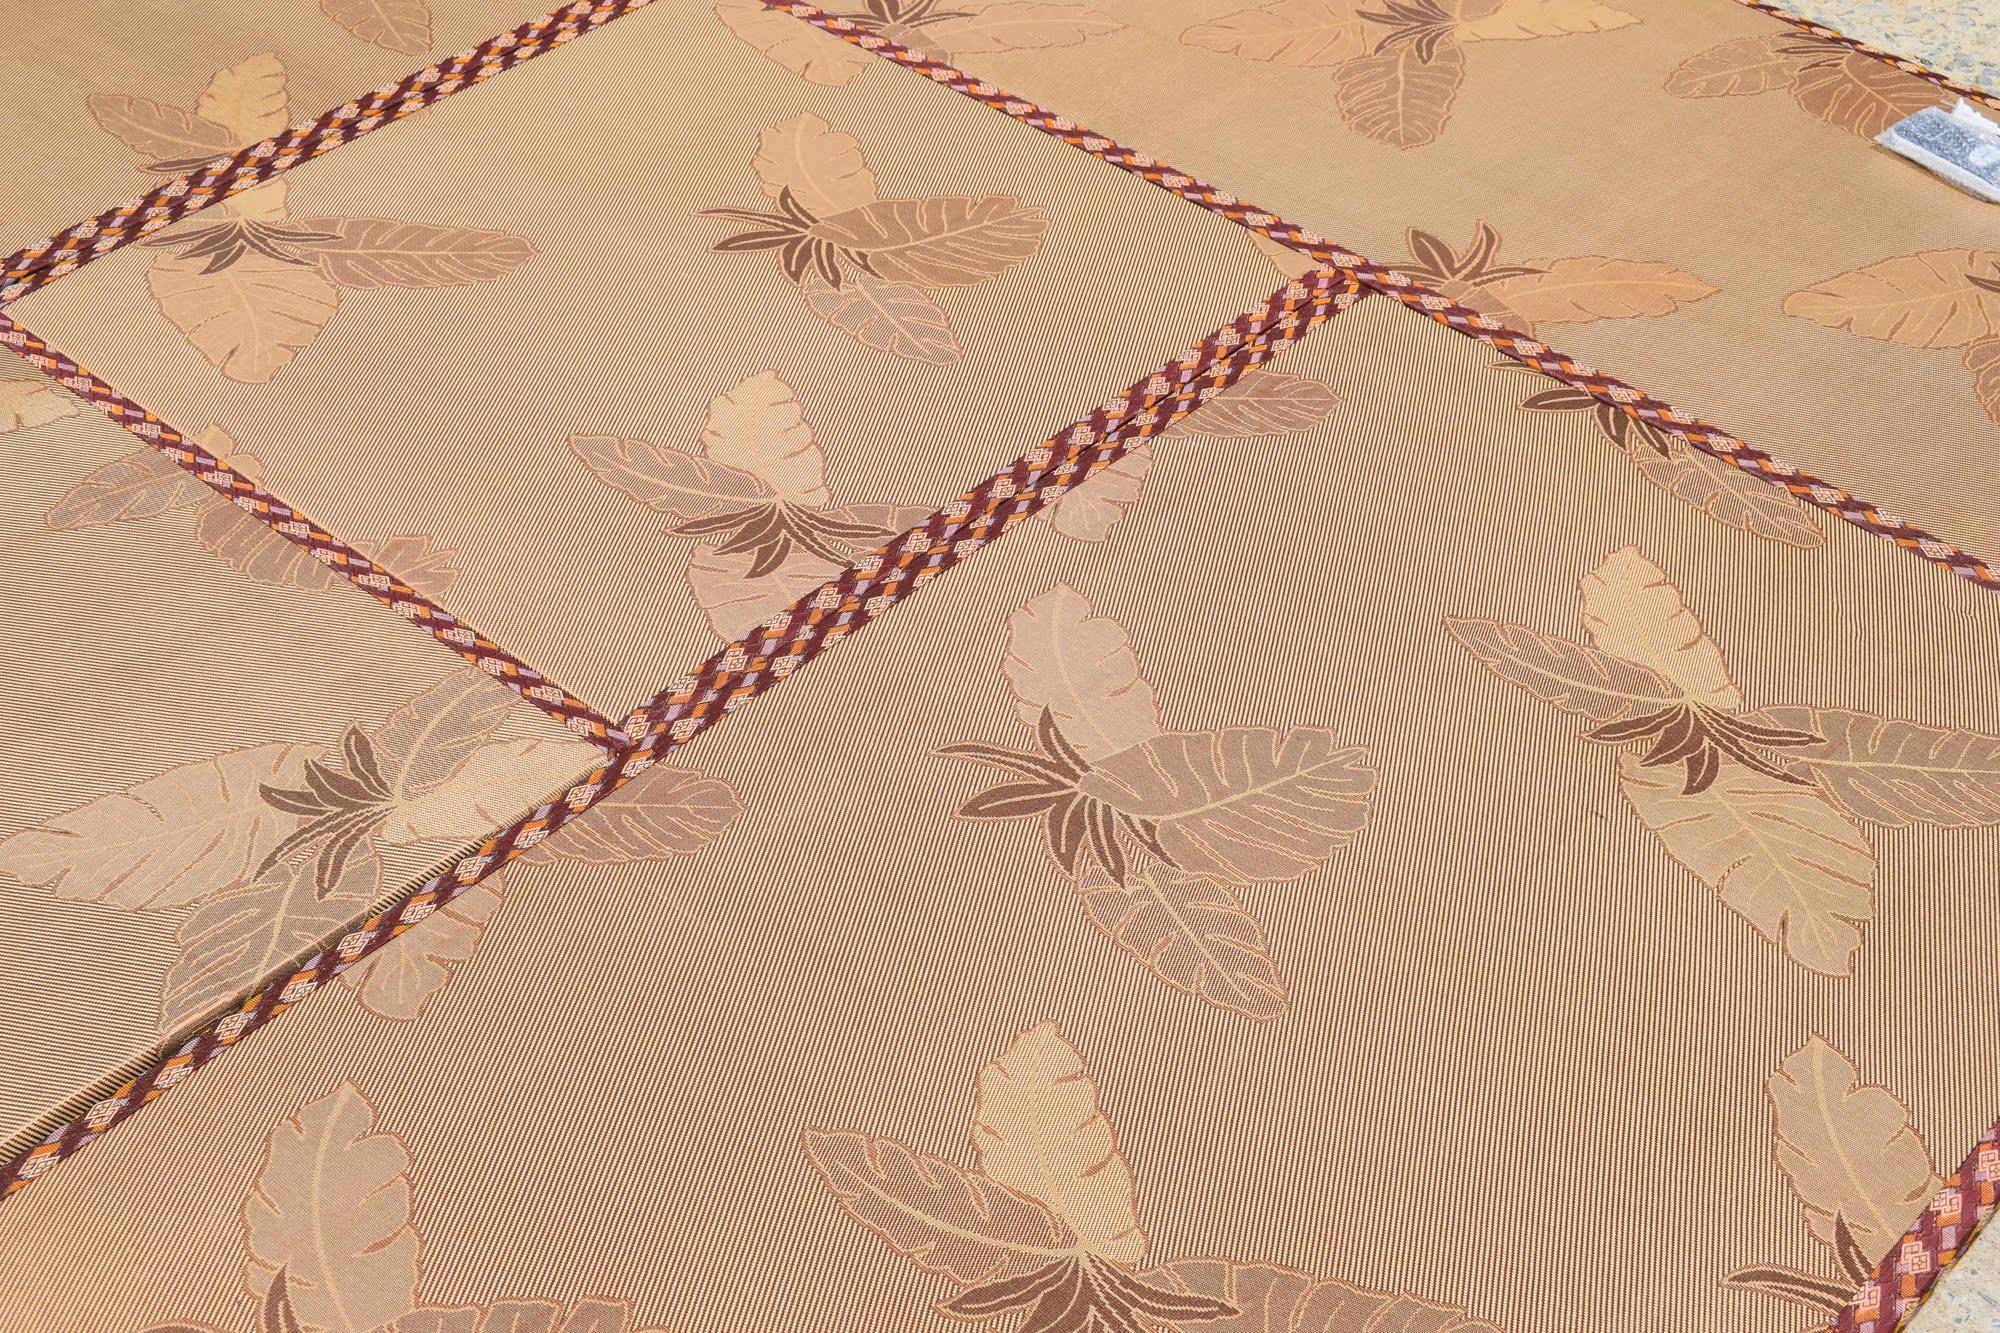 Japanese tatami mats and natural coconut palm mattress core Royal rattan mat straw mattress pad platform tailored